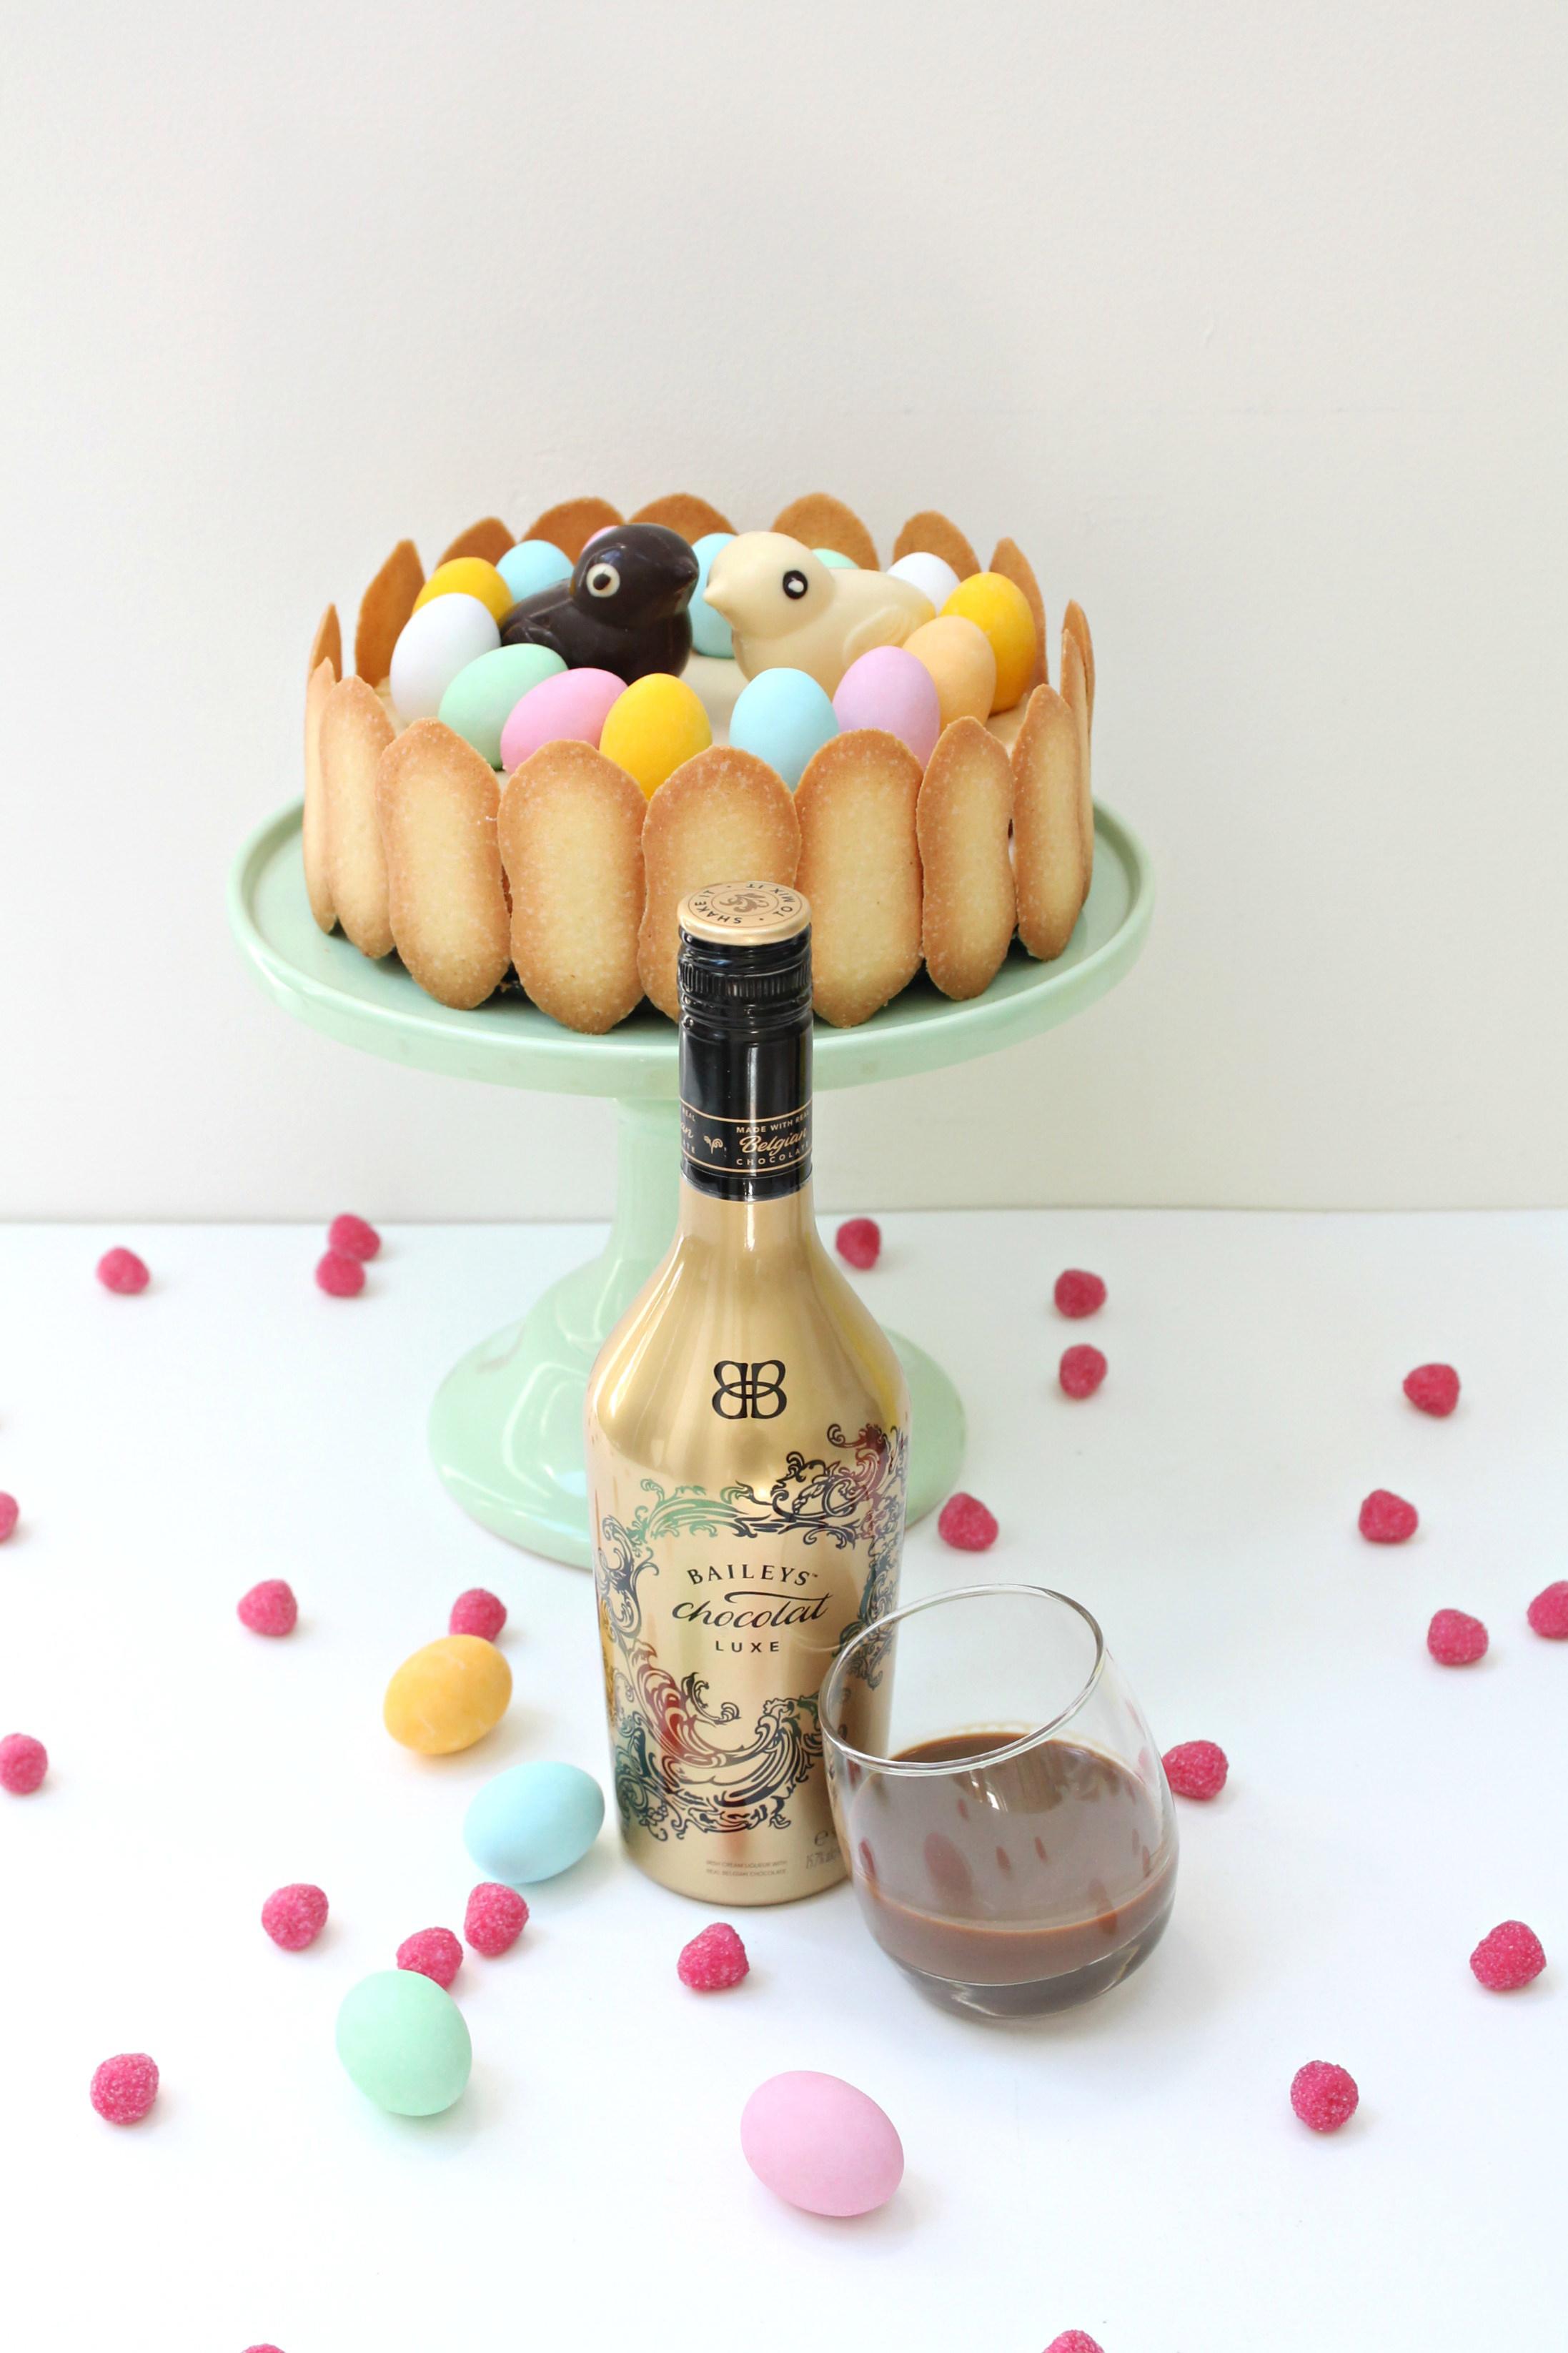 Baileys-chocolat-luxe-cheesecake-recipe